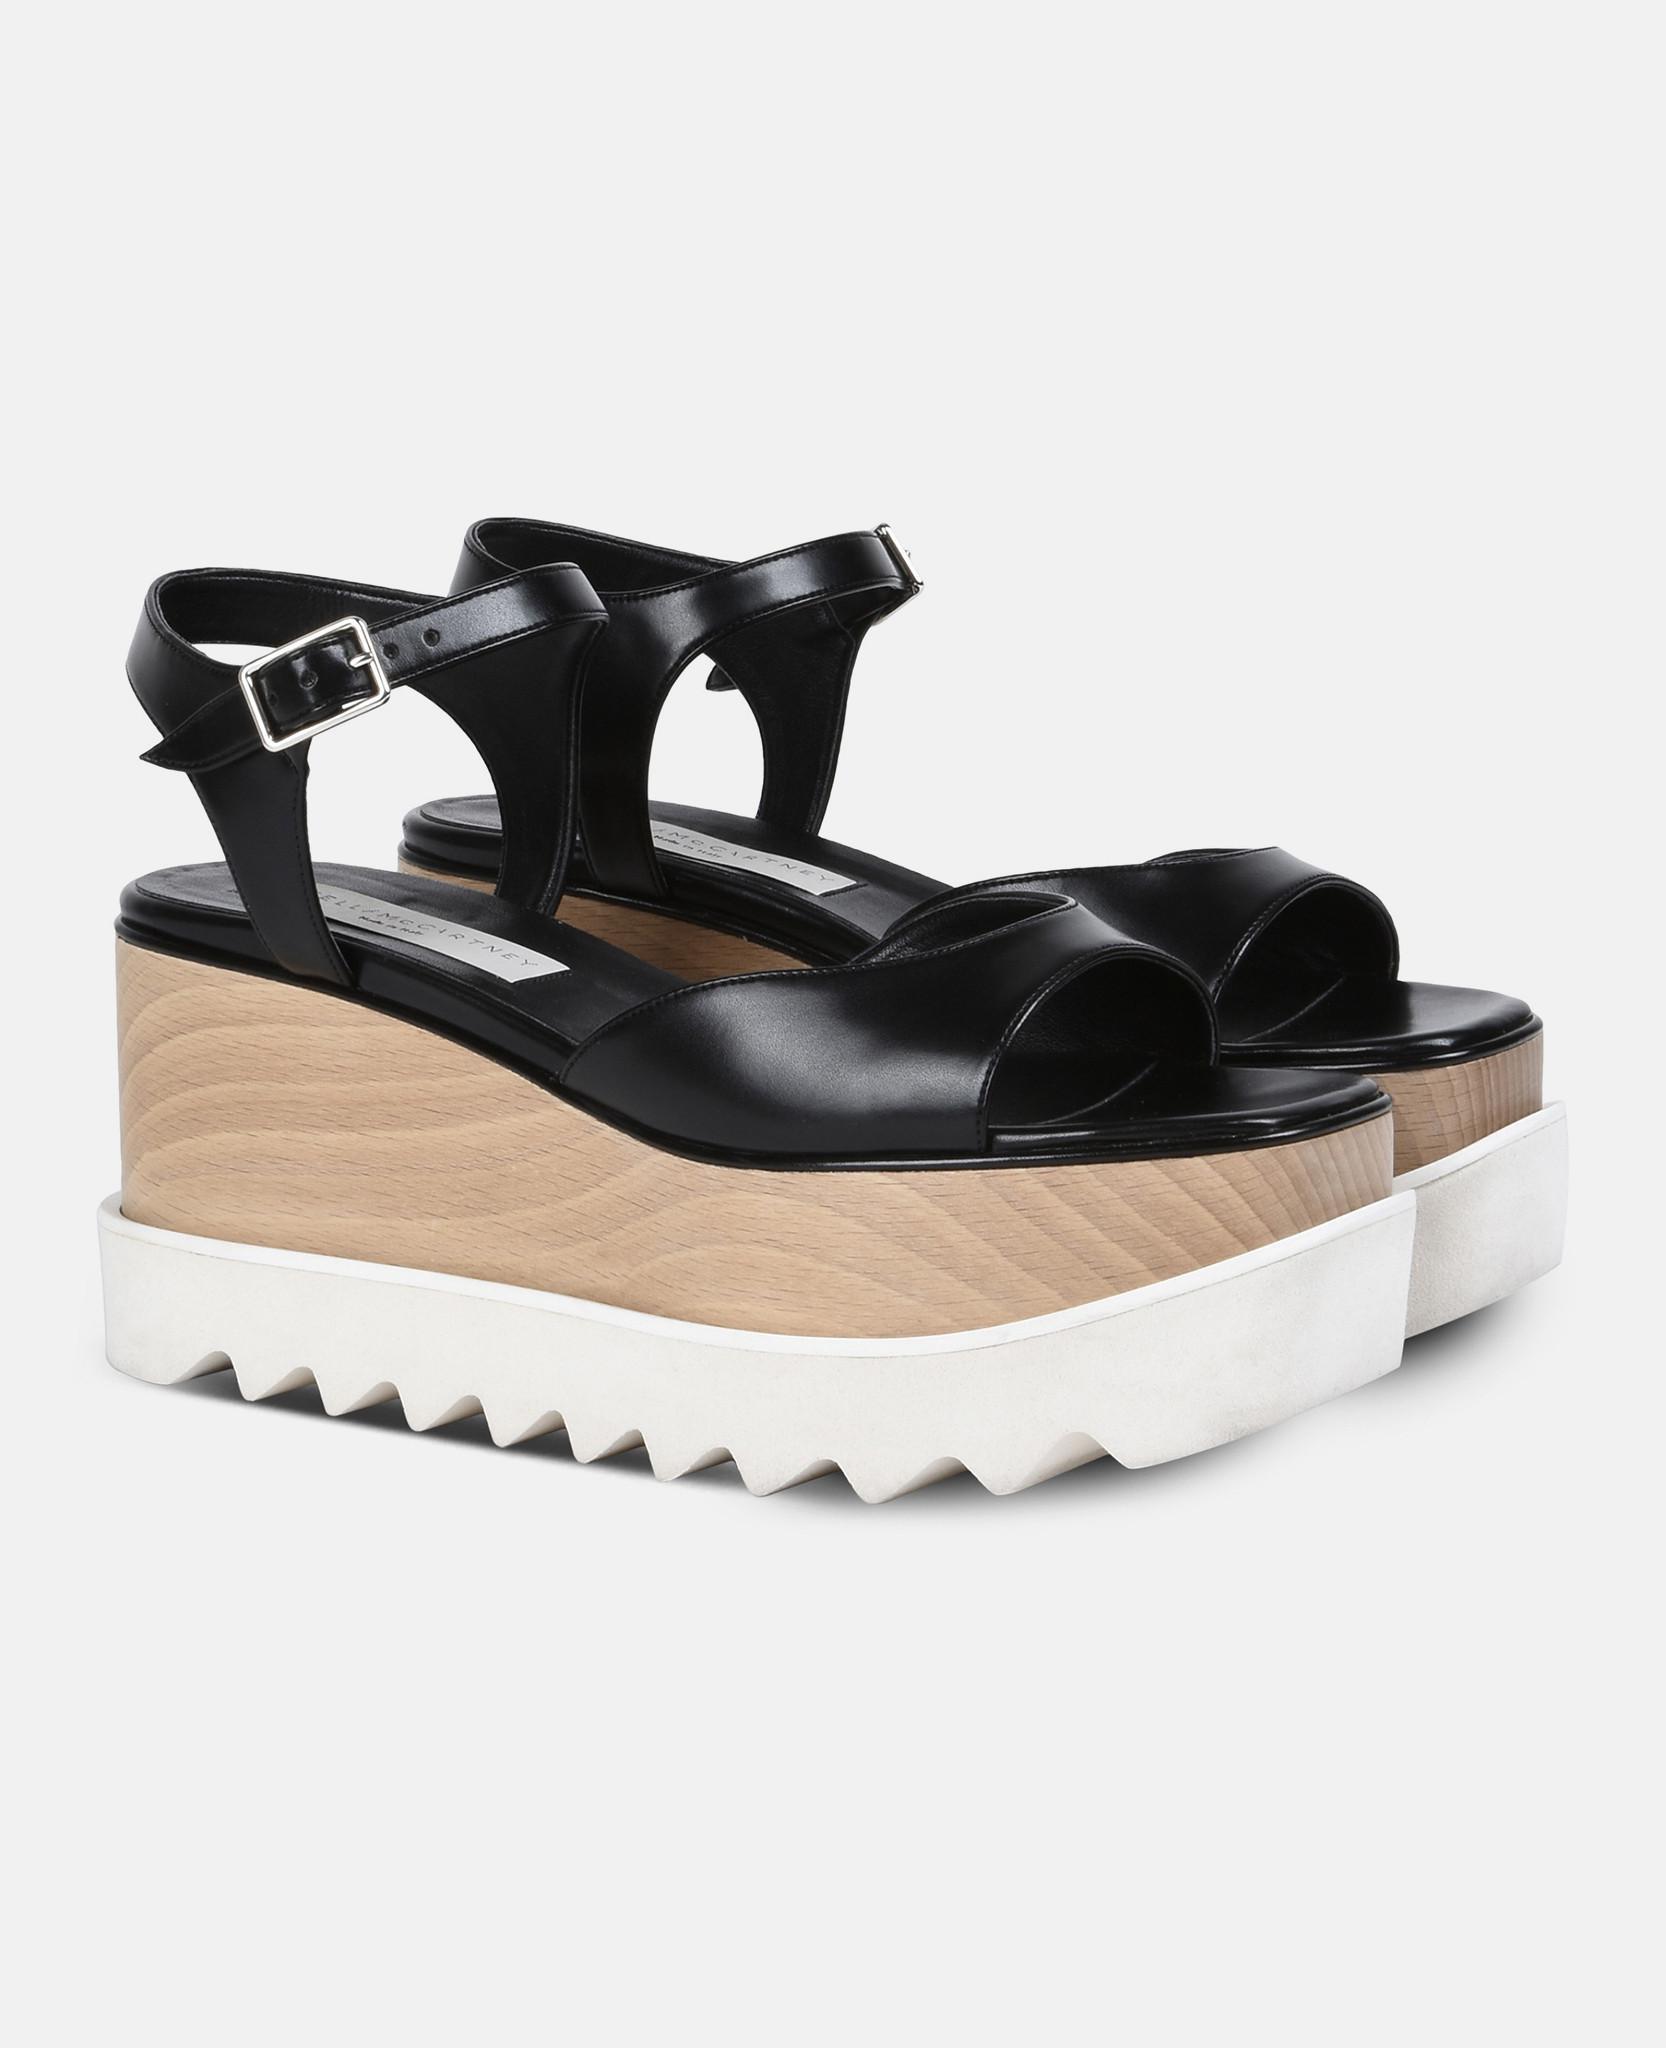 4671d3be023 Stella McCartney Black Elyse Sandals in Black - Lyst